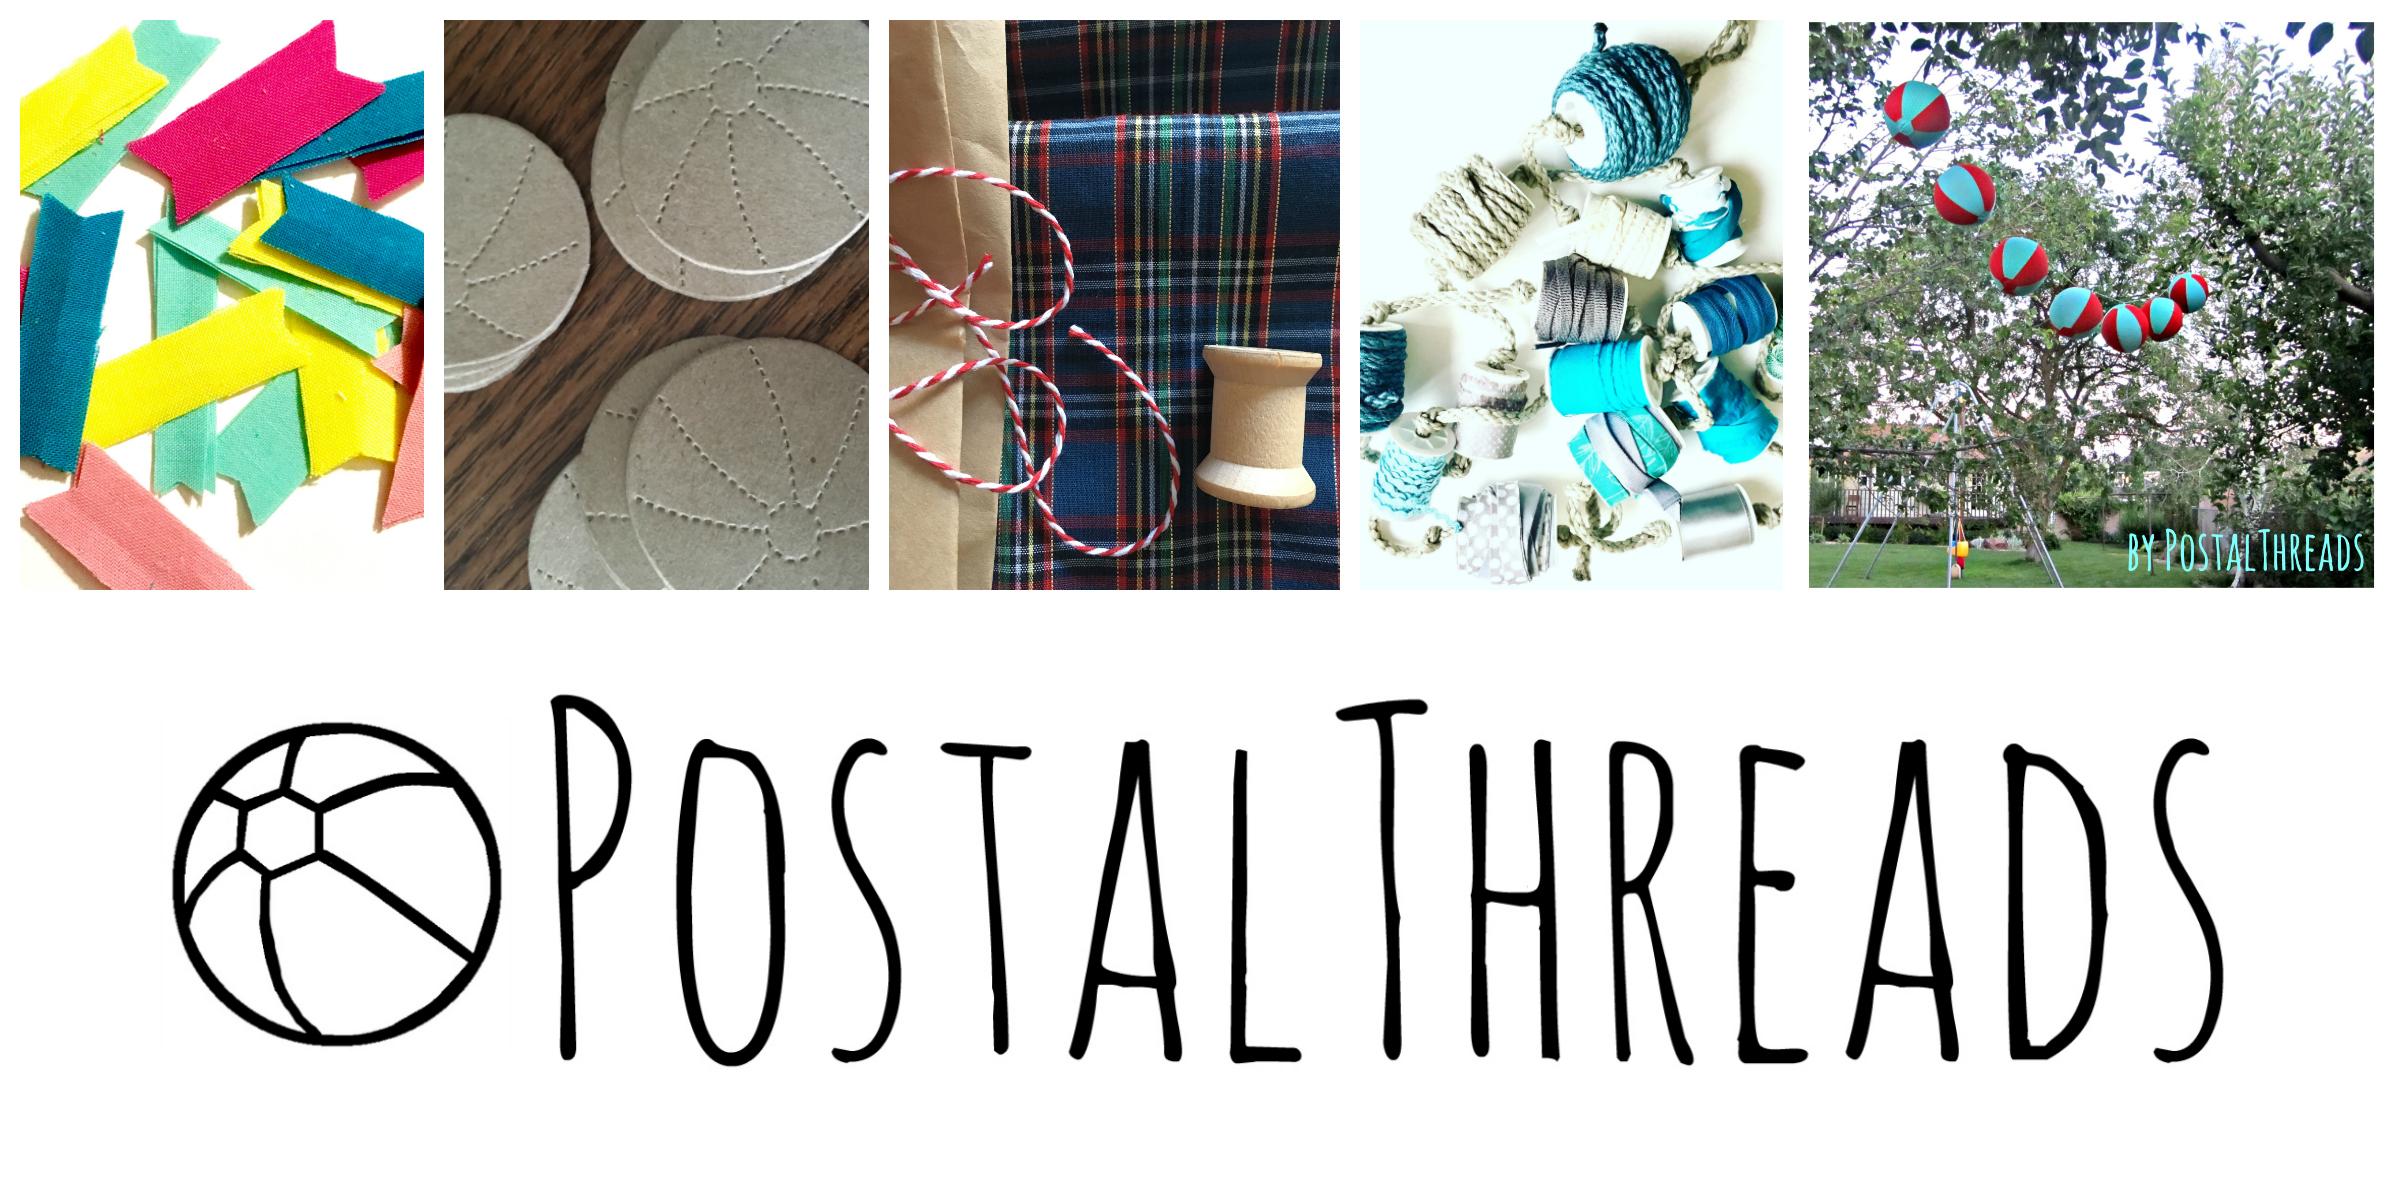 Photo 1 PostalThreads brand collage.jpg